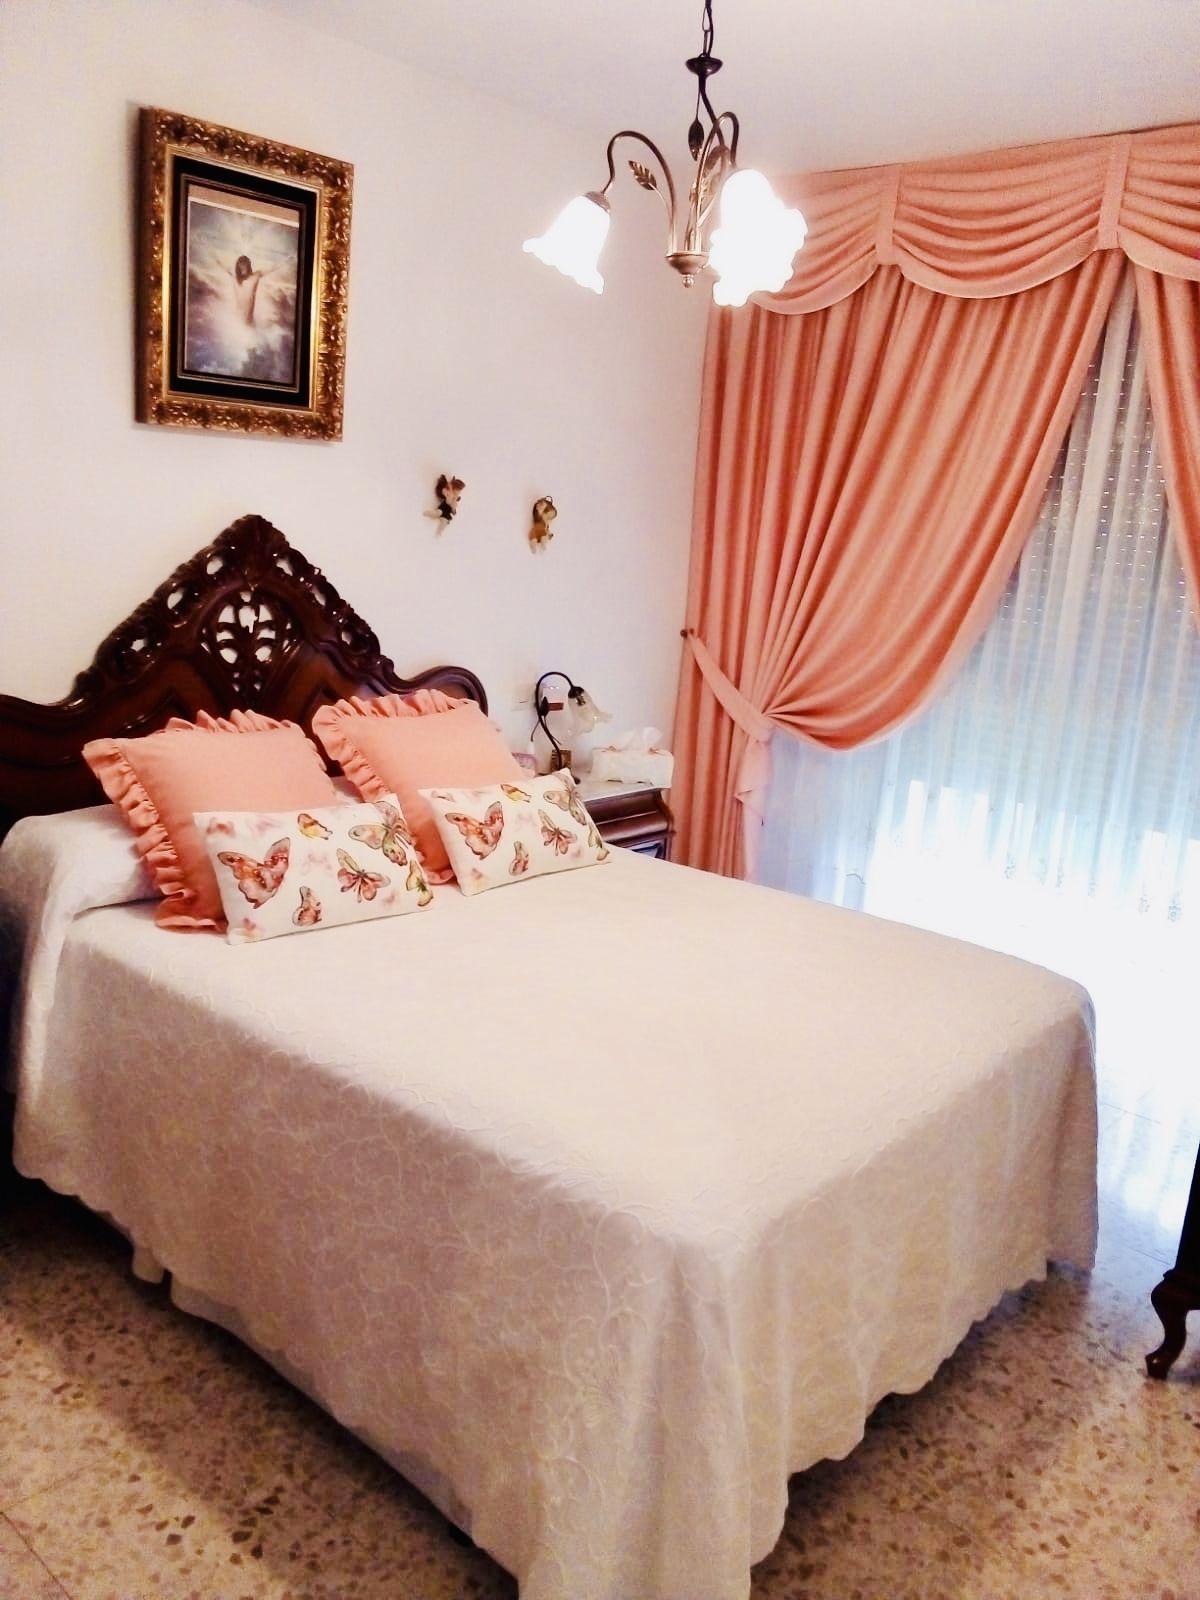 Apartamento en Fuengirola, FUENGIROLA CENTRO, venta